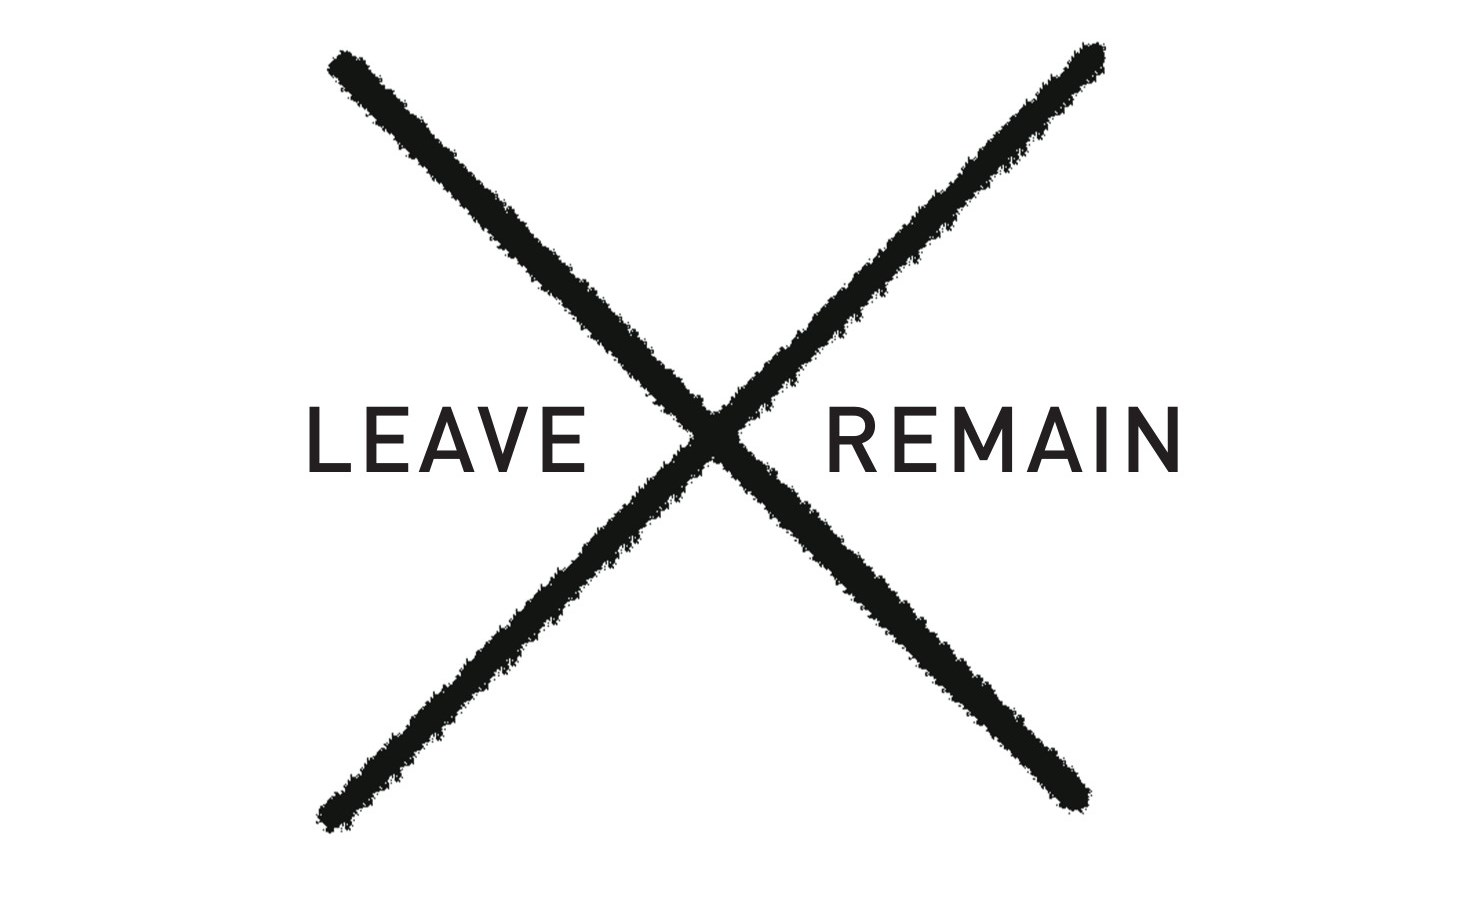 EU Referendum 2016: A Guide for Voters